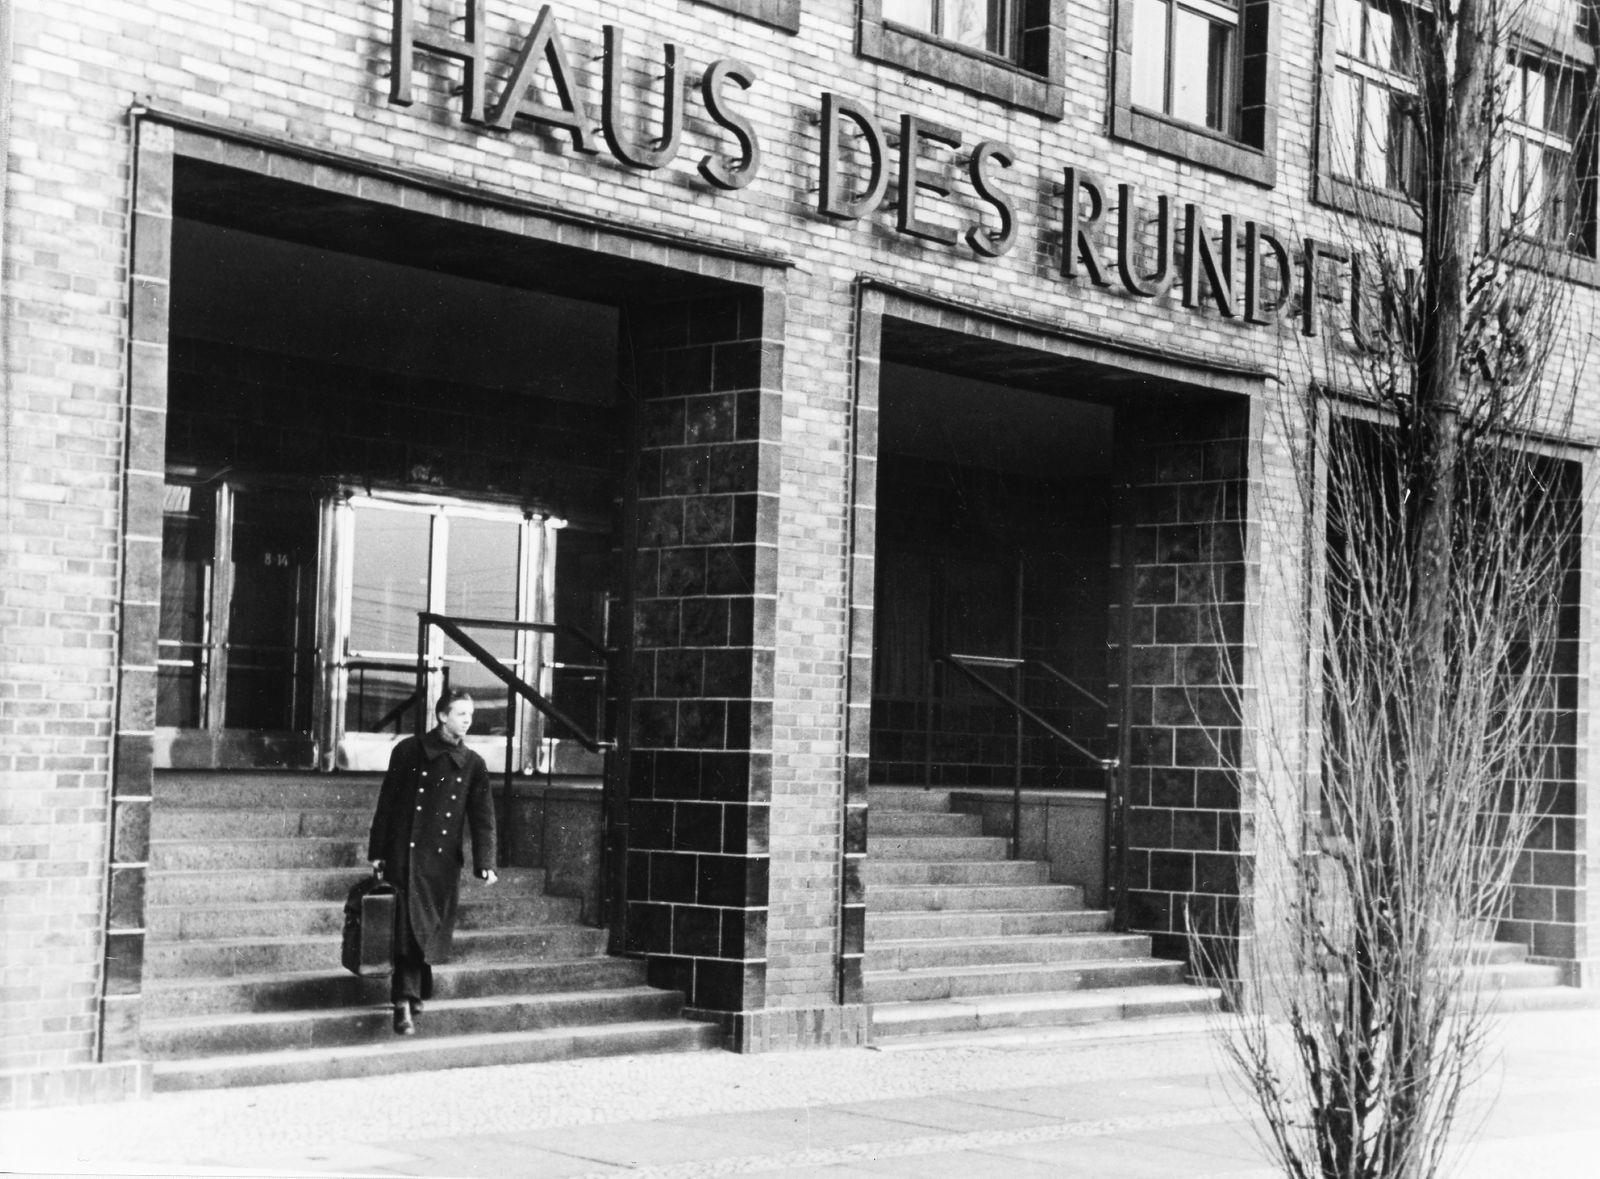 Rundfunkhaus Berlin